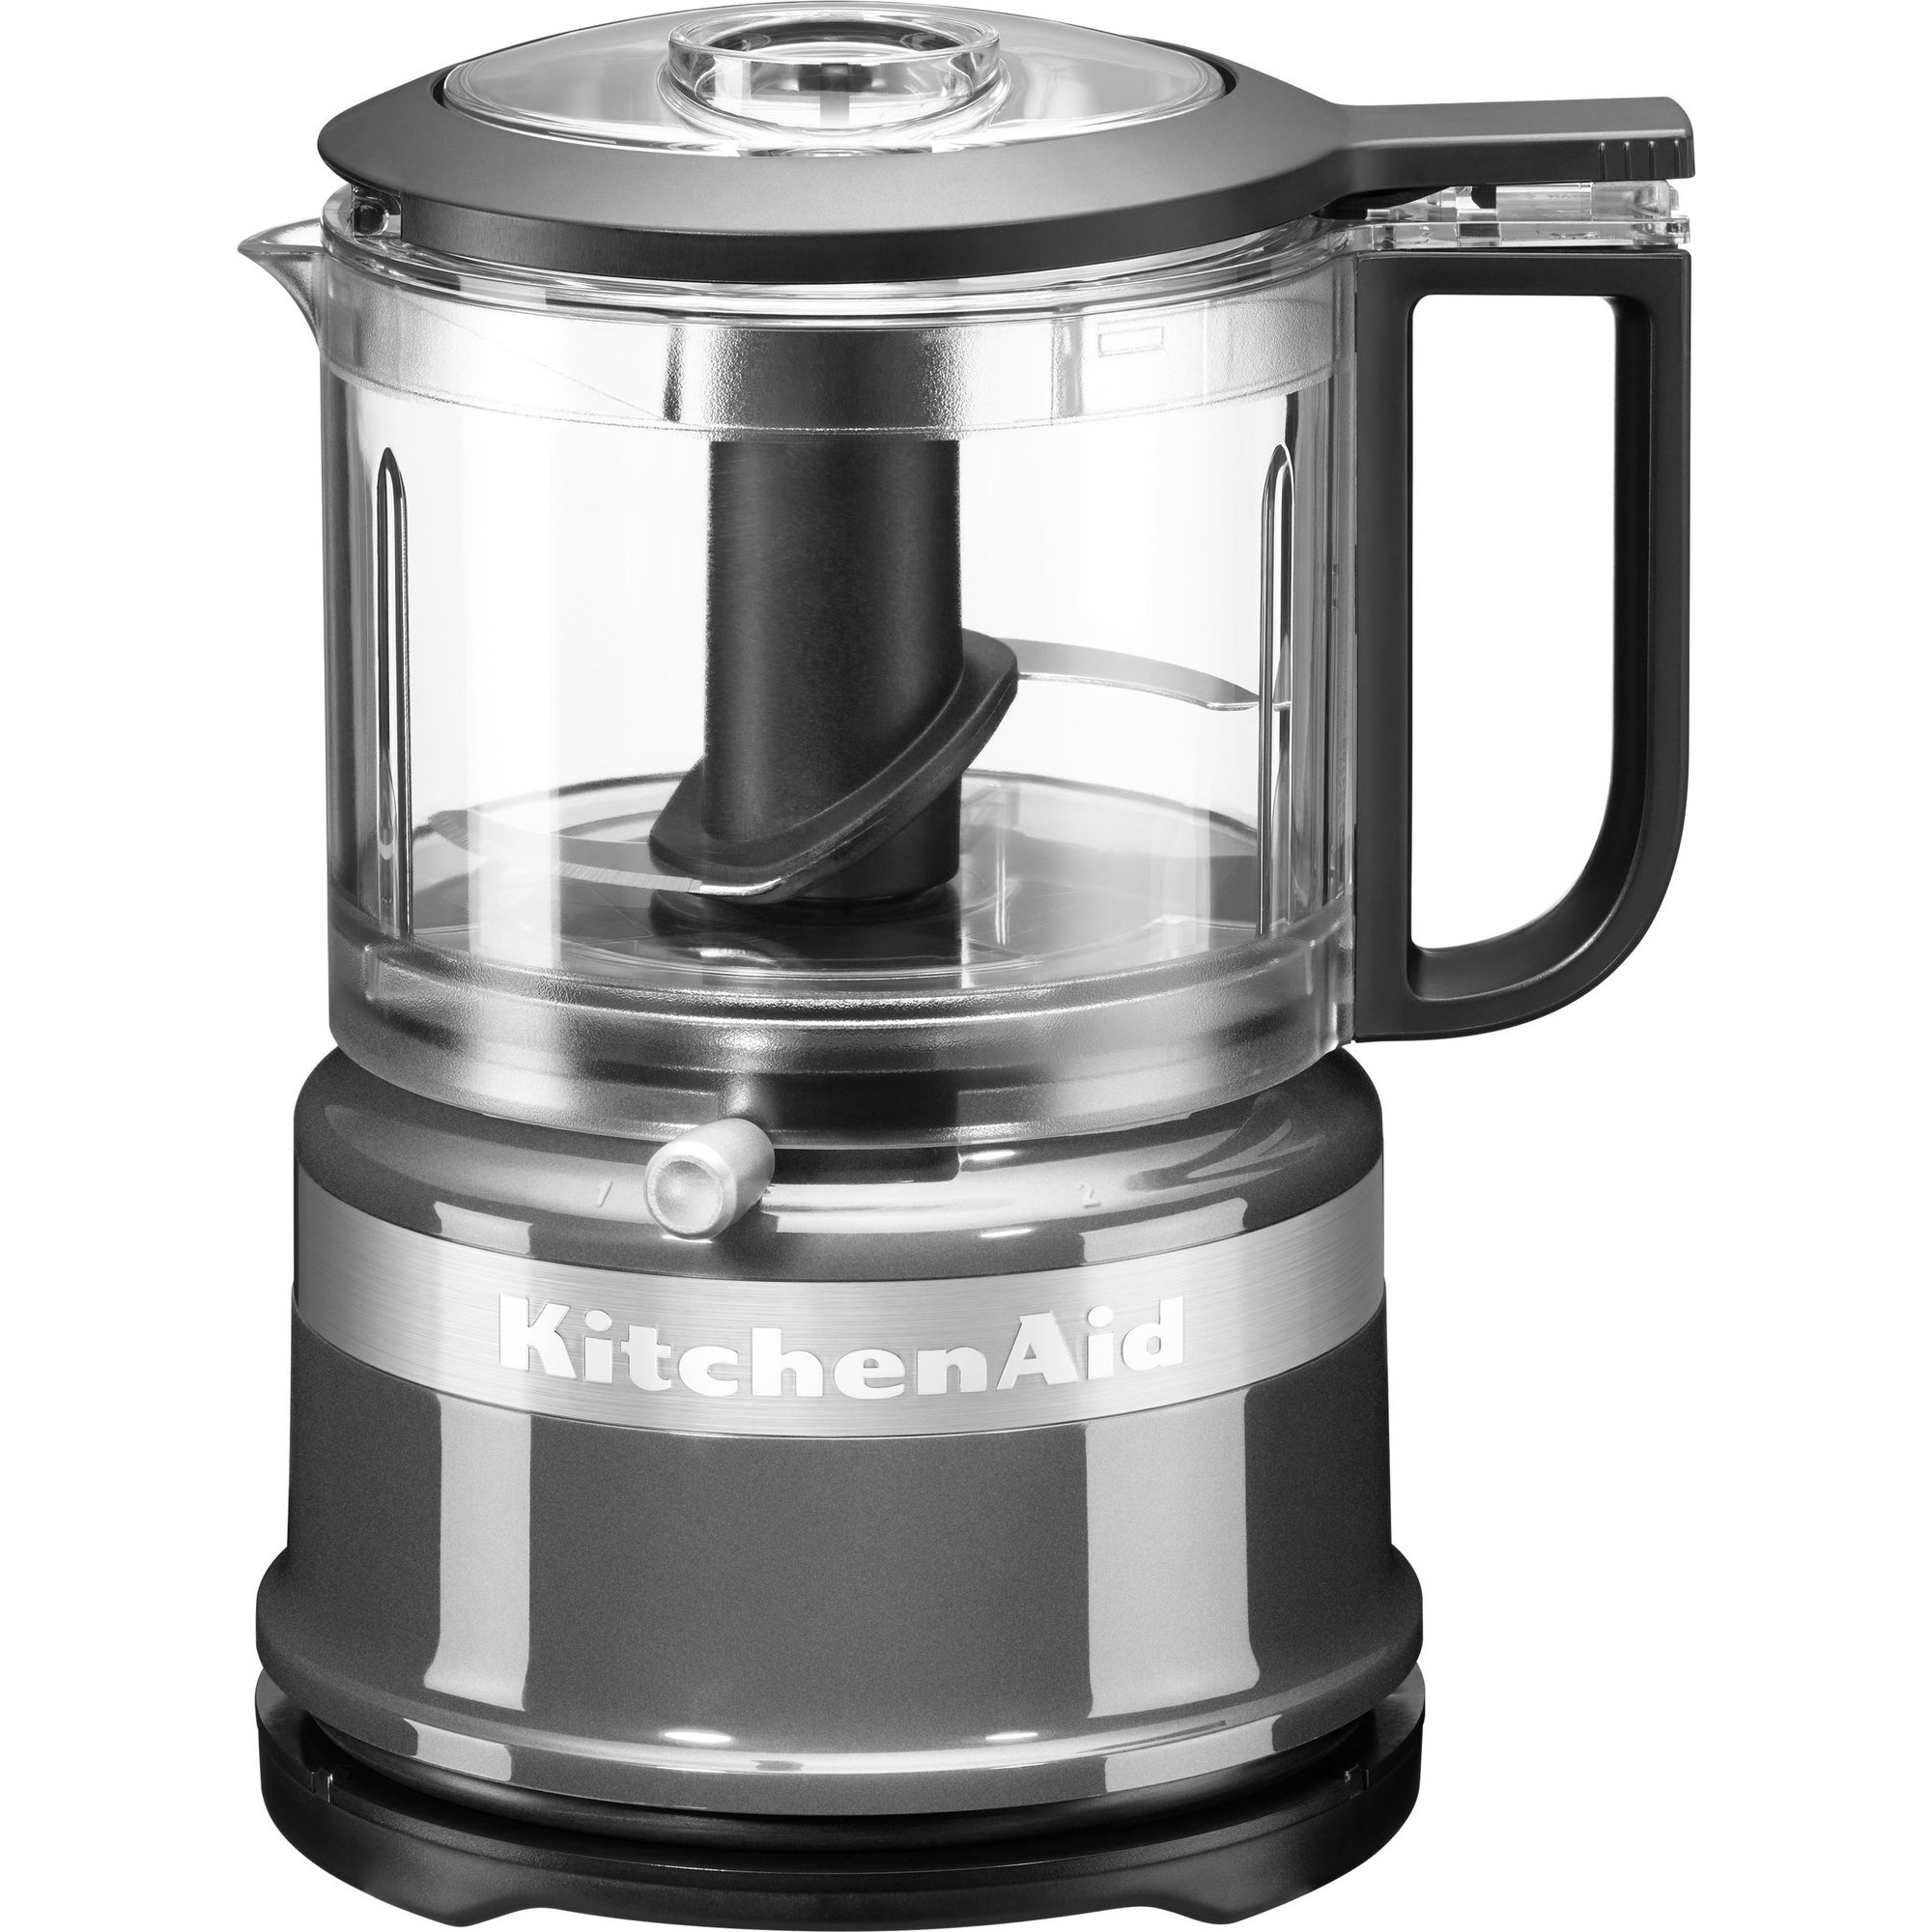 KitchenAid Mini Matberedare 5KFC3516ECU 095 LContour Silver